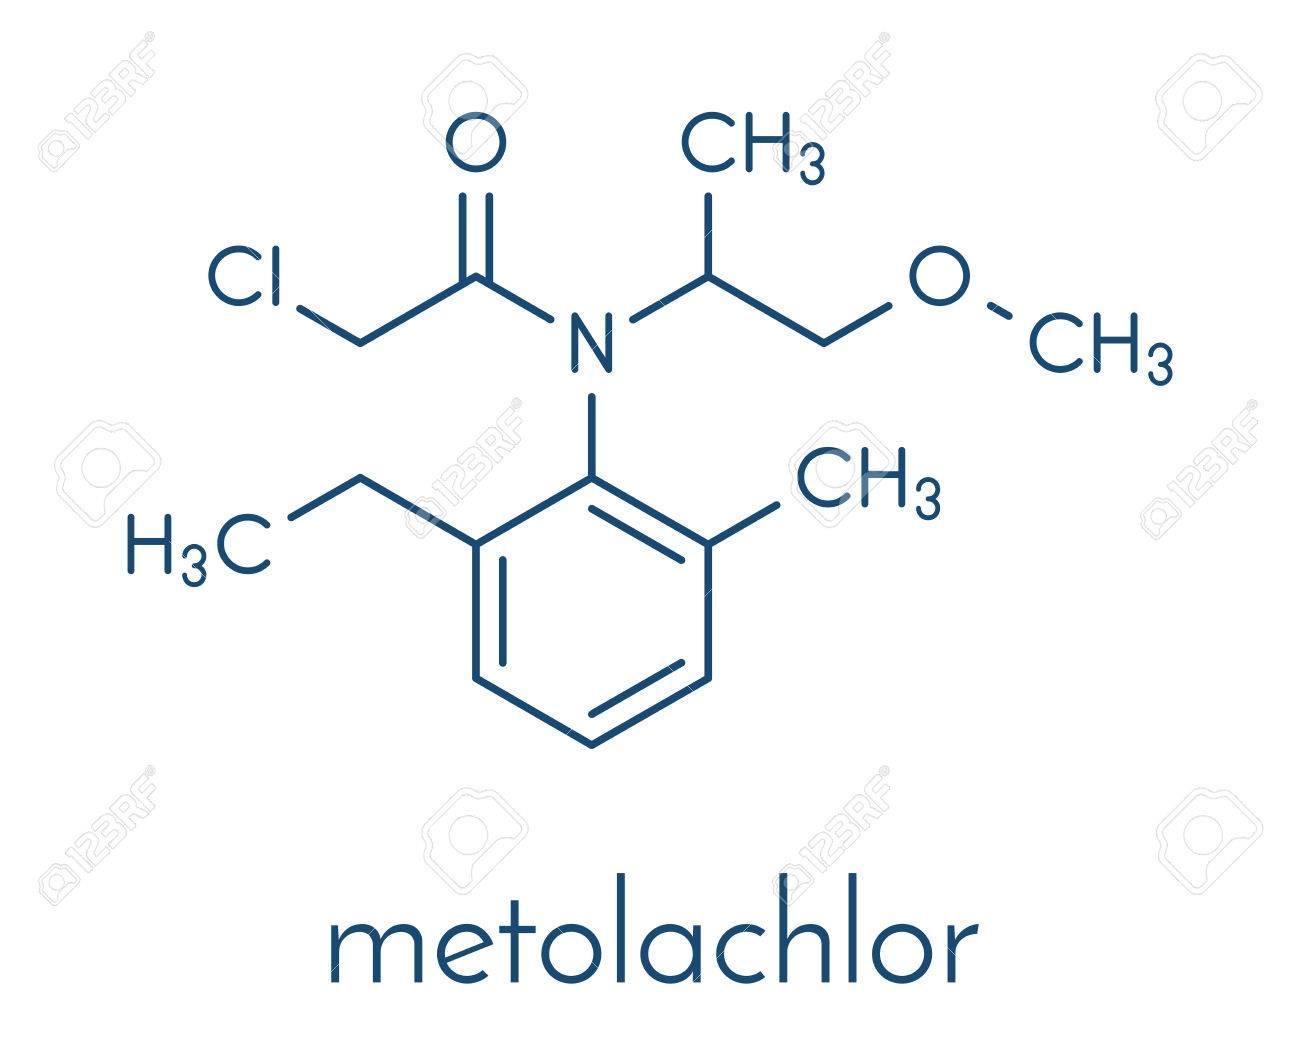 Metolachlor herbicide weed killer molecule skeletal formula metolachlor herbicide weed killer molecule skeletal formula stock vector 87062667 biocorpaavc Choice Image